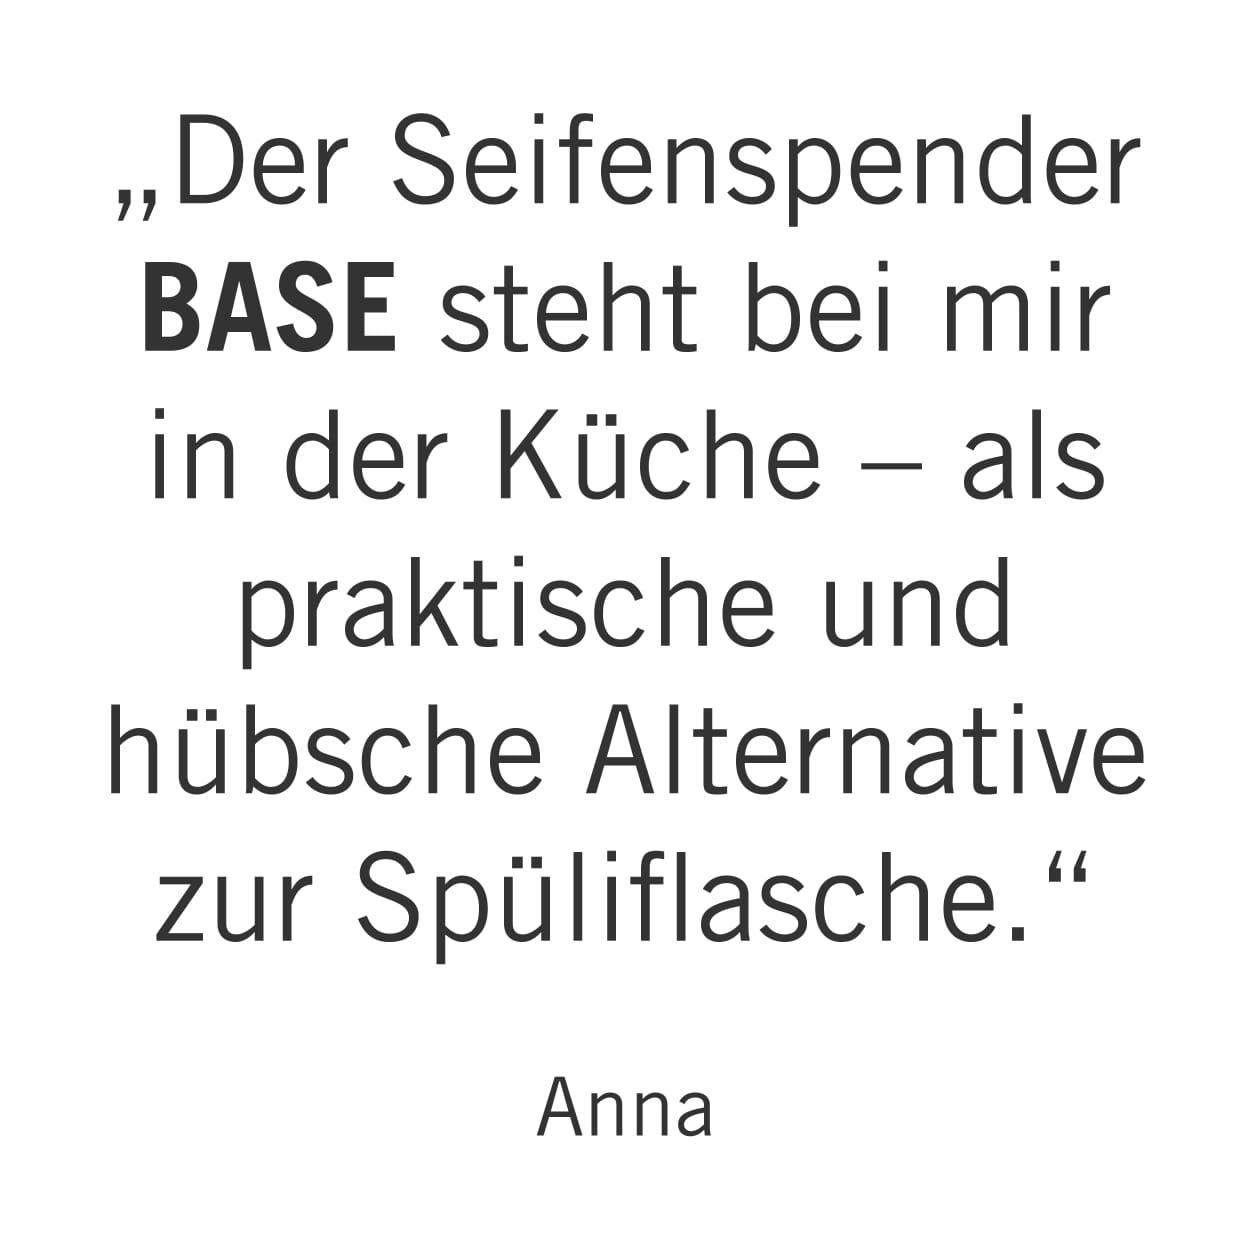 SEIFENSPENDER BASE